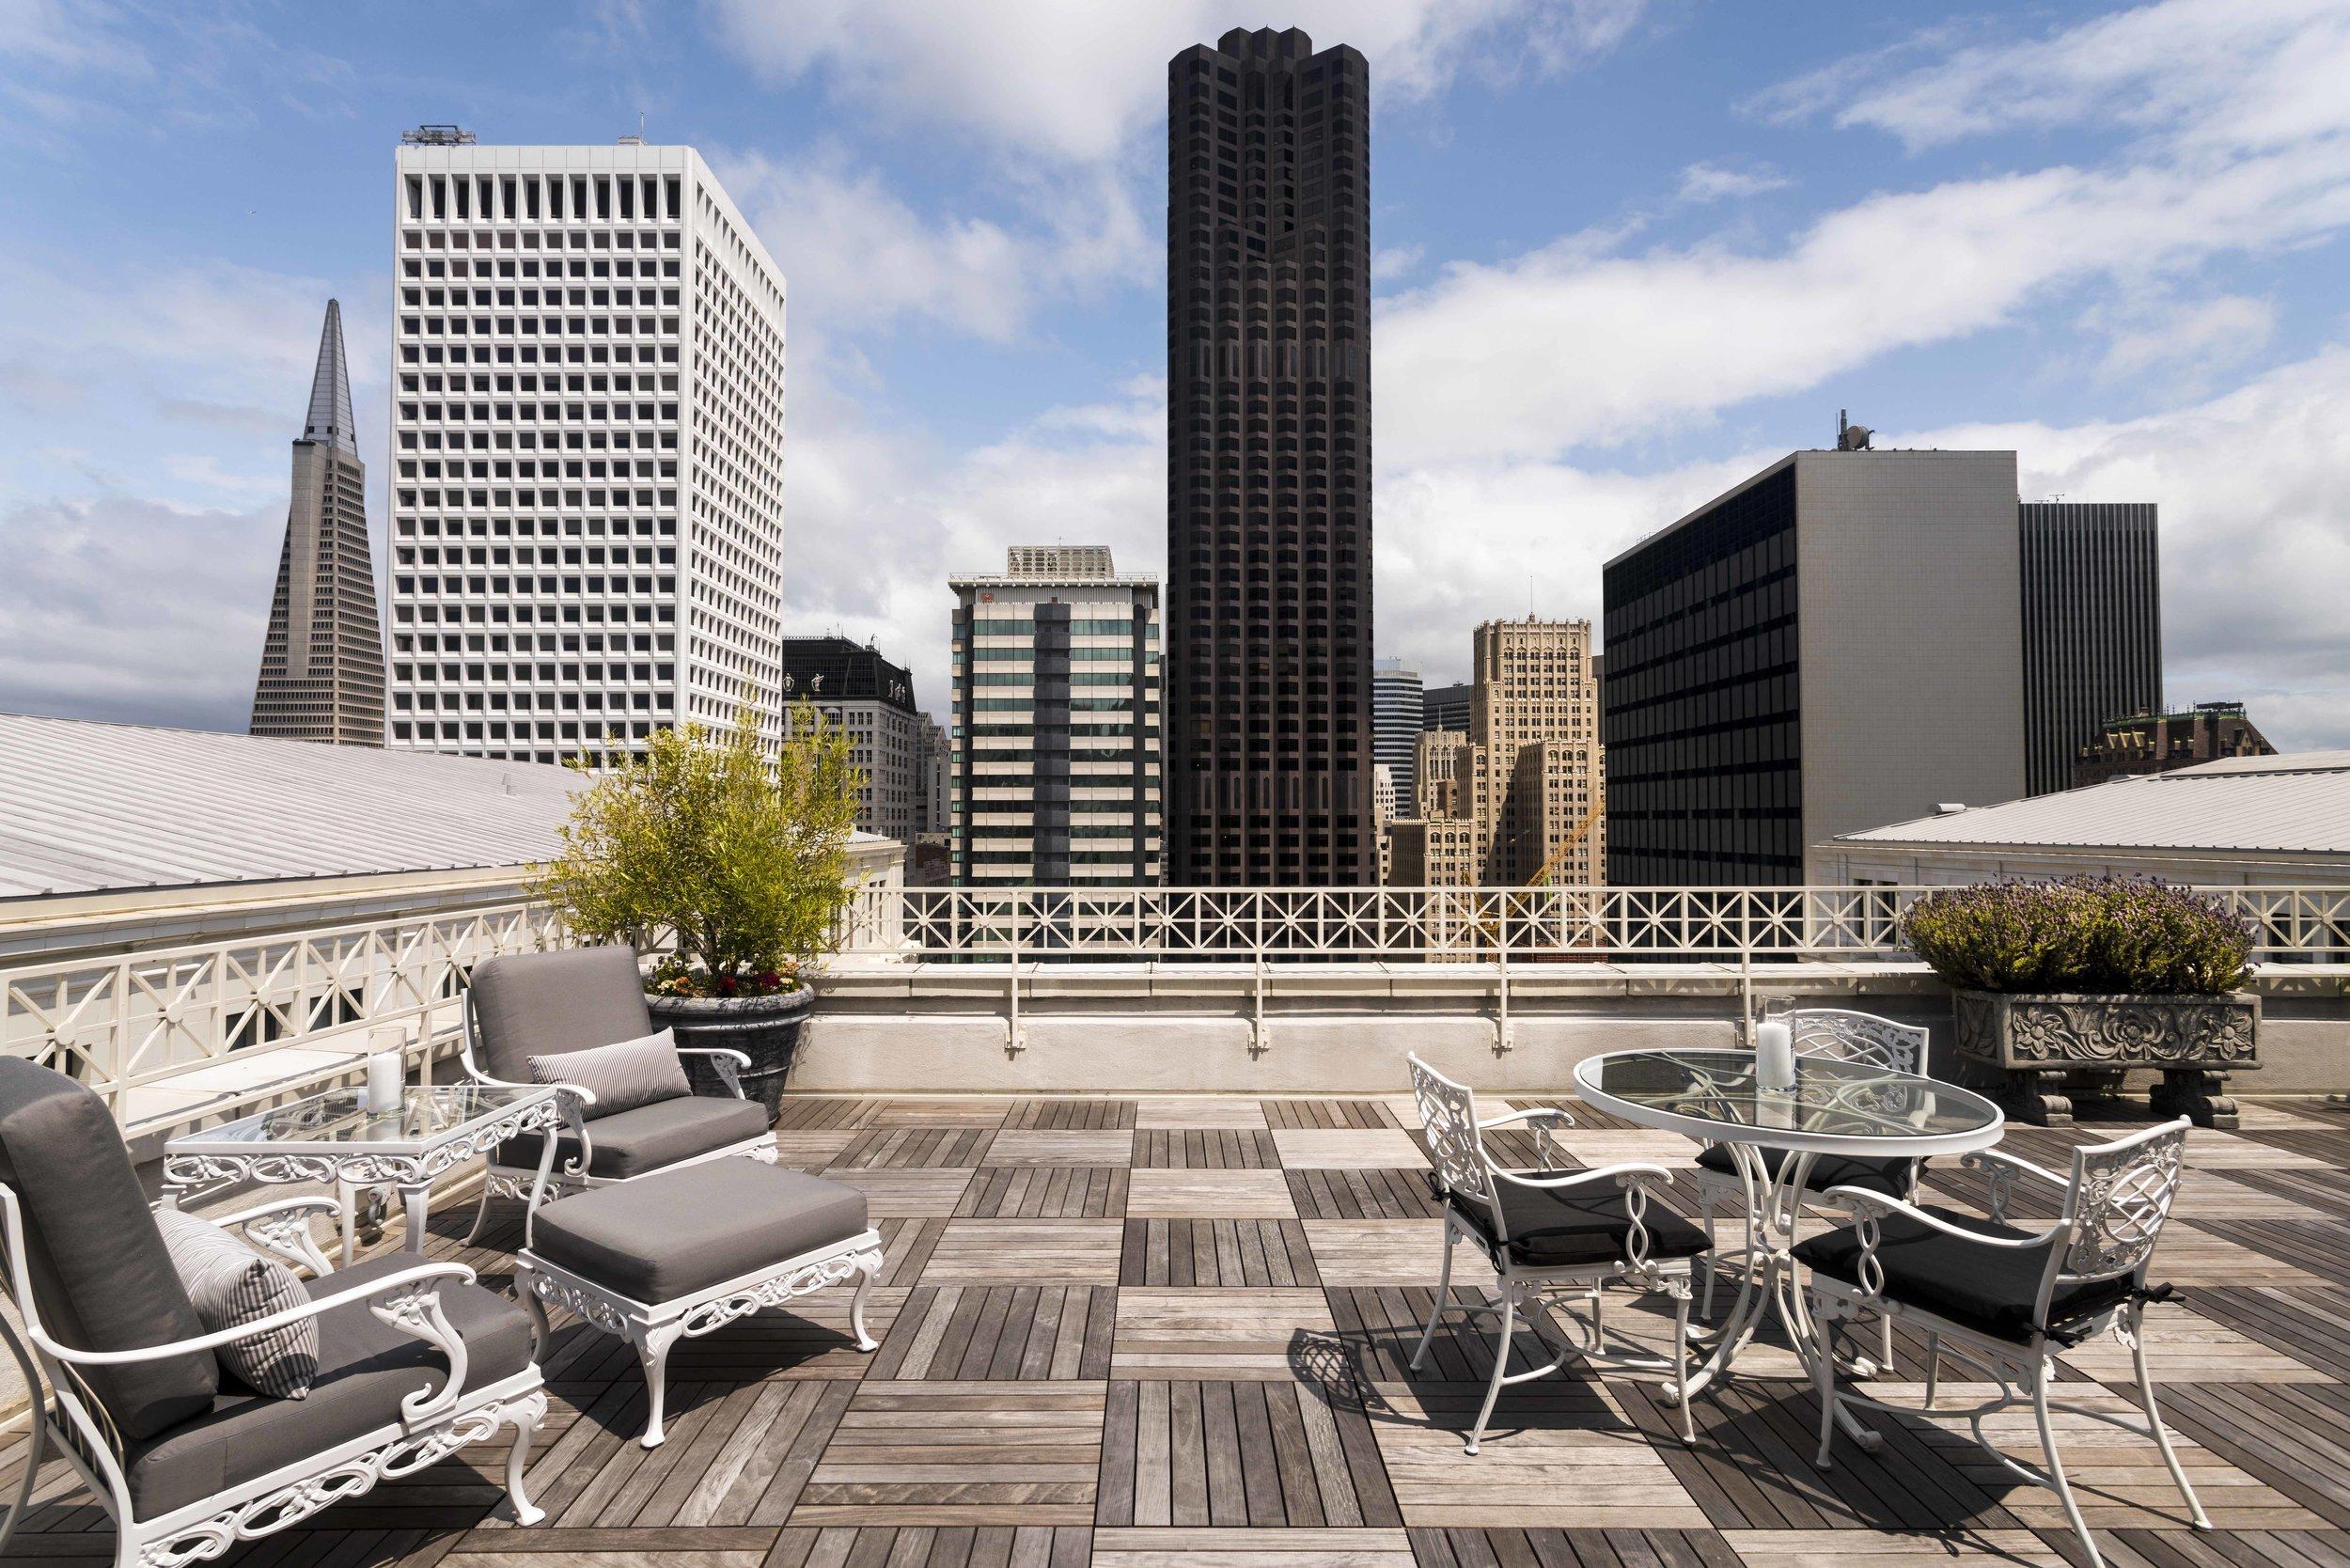 Ritz-Carlton San Francisco - Presidential Suite Balcony.jpg